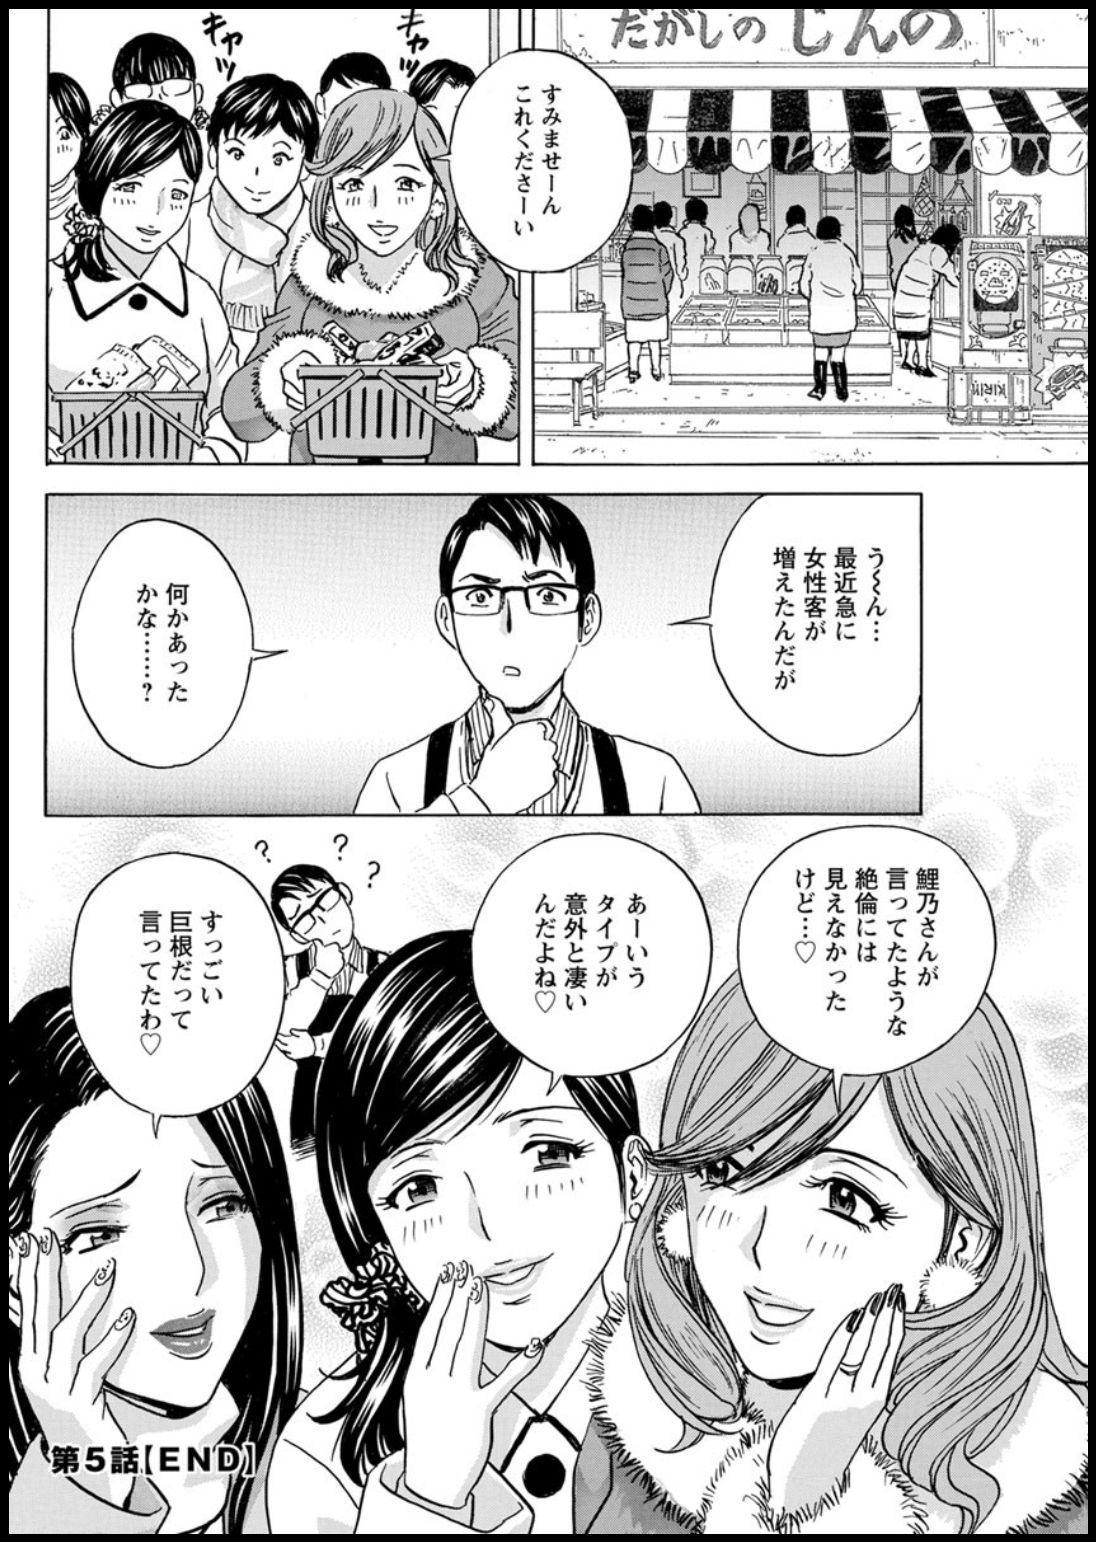 [Hidemaru] Yurase Bikyonyuu! Hataraku J-Cup Ch. 1-5 [Digital] 91